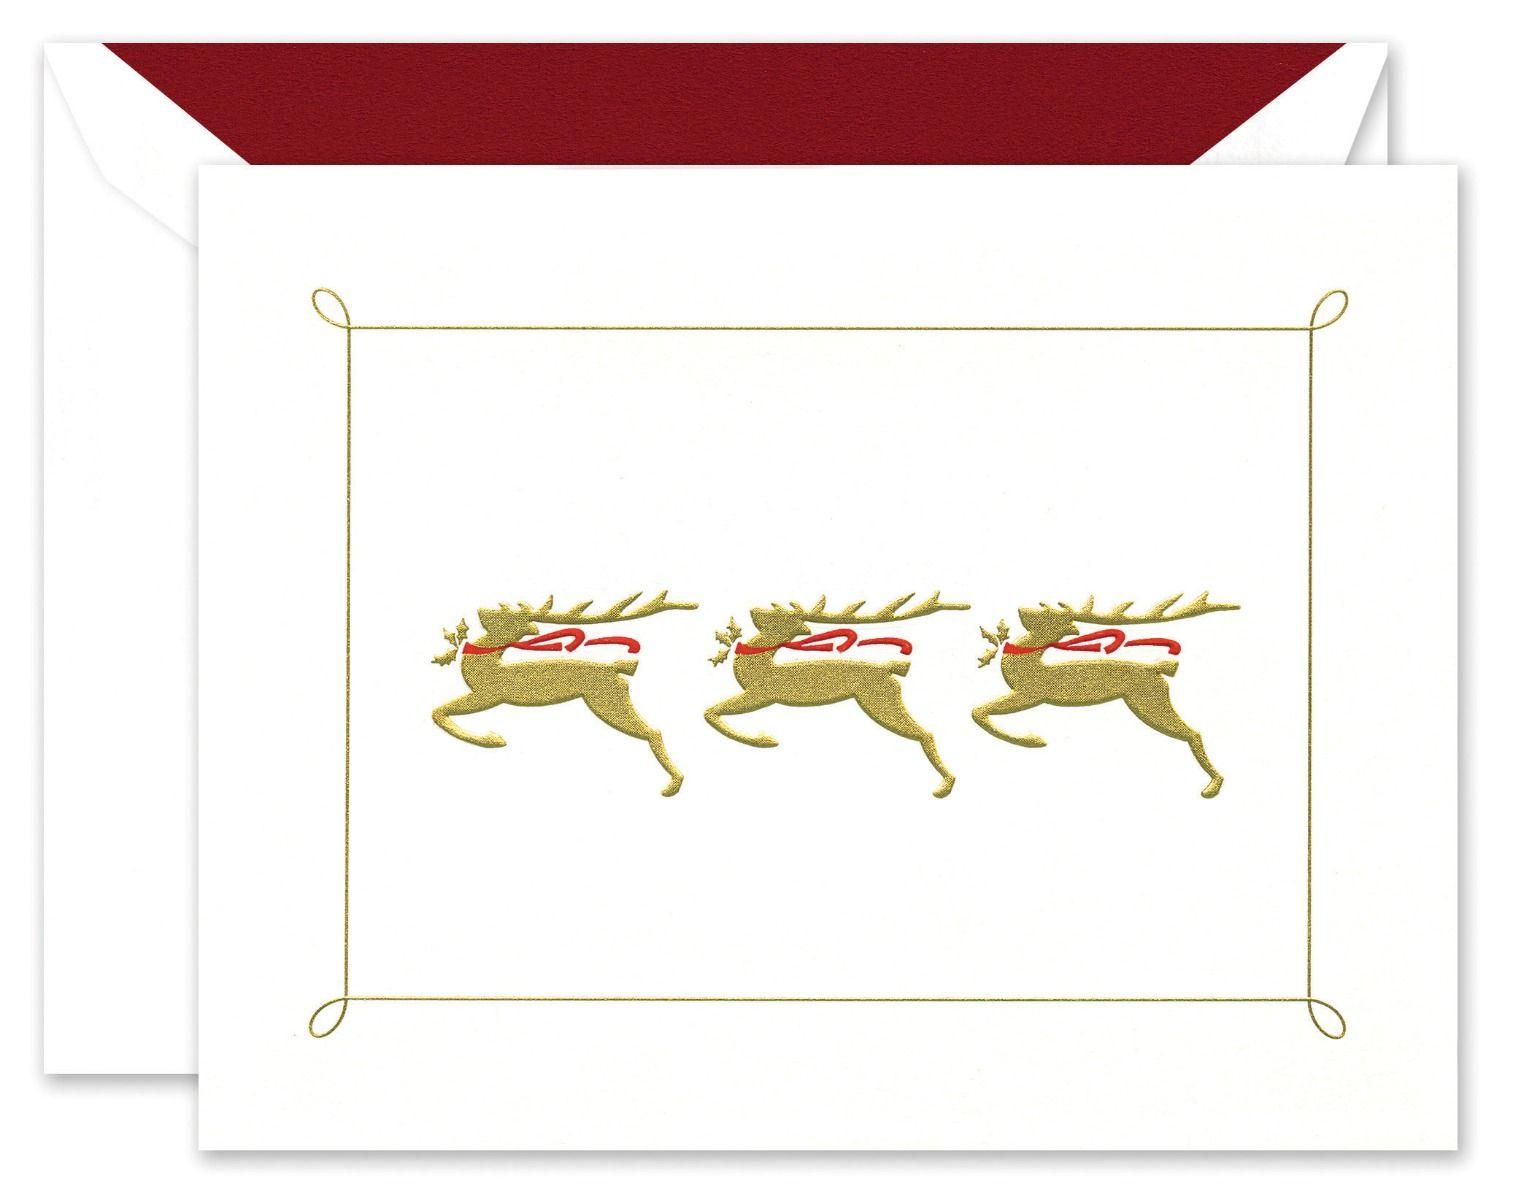 Prancing Deer Greeting Card